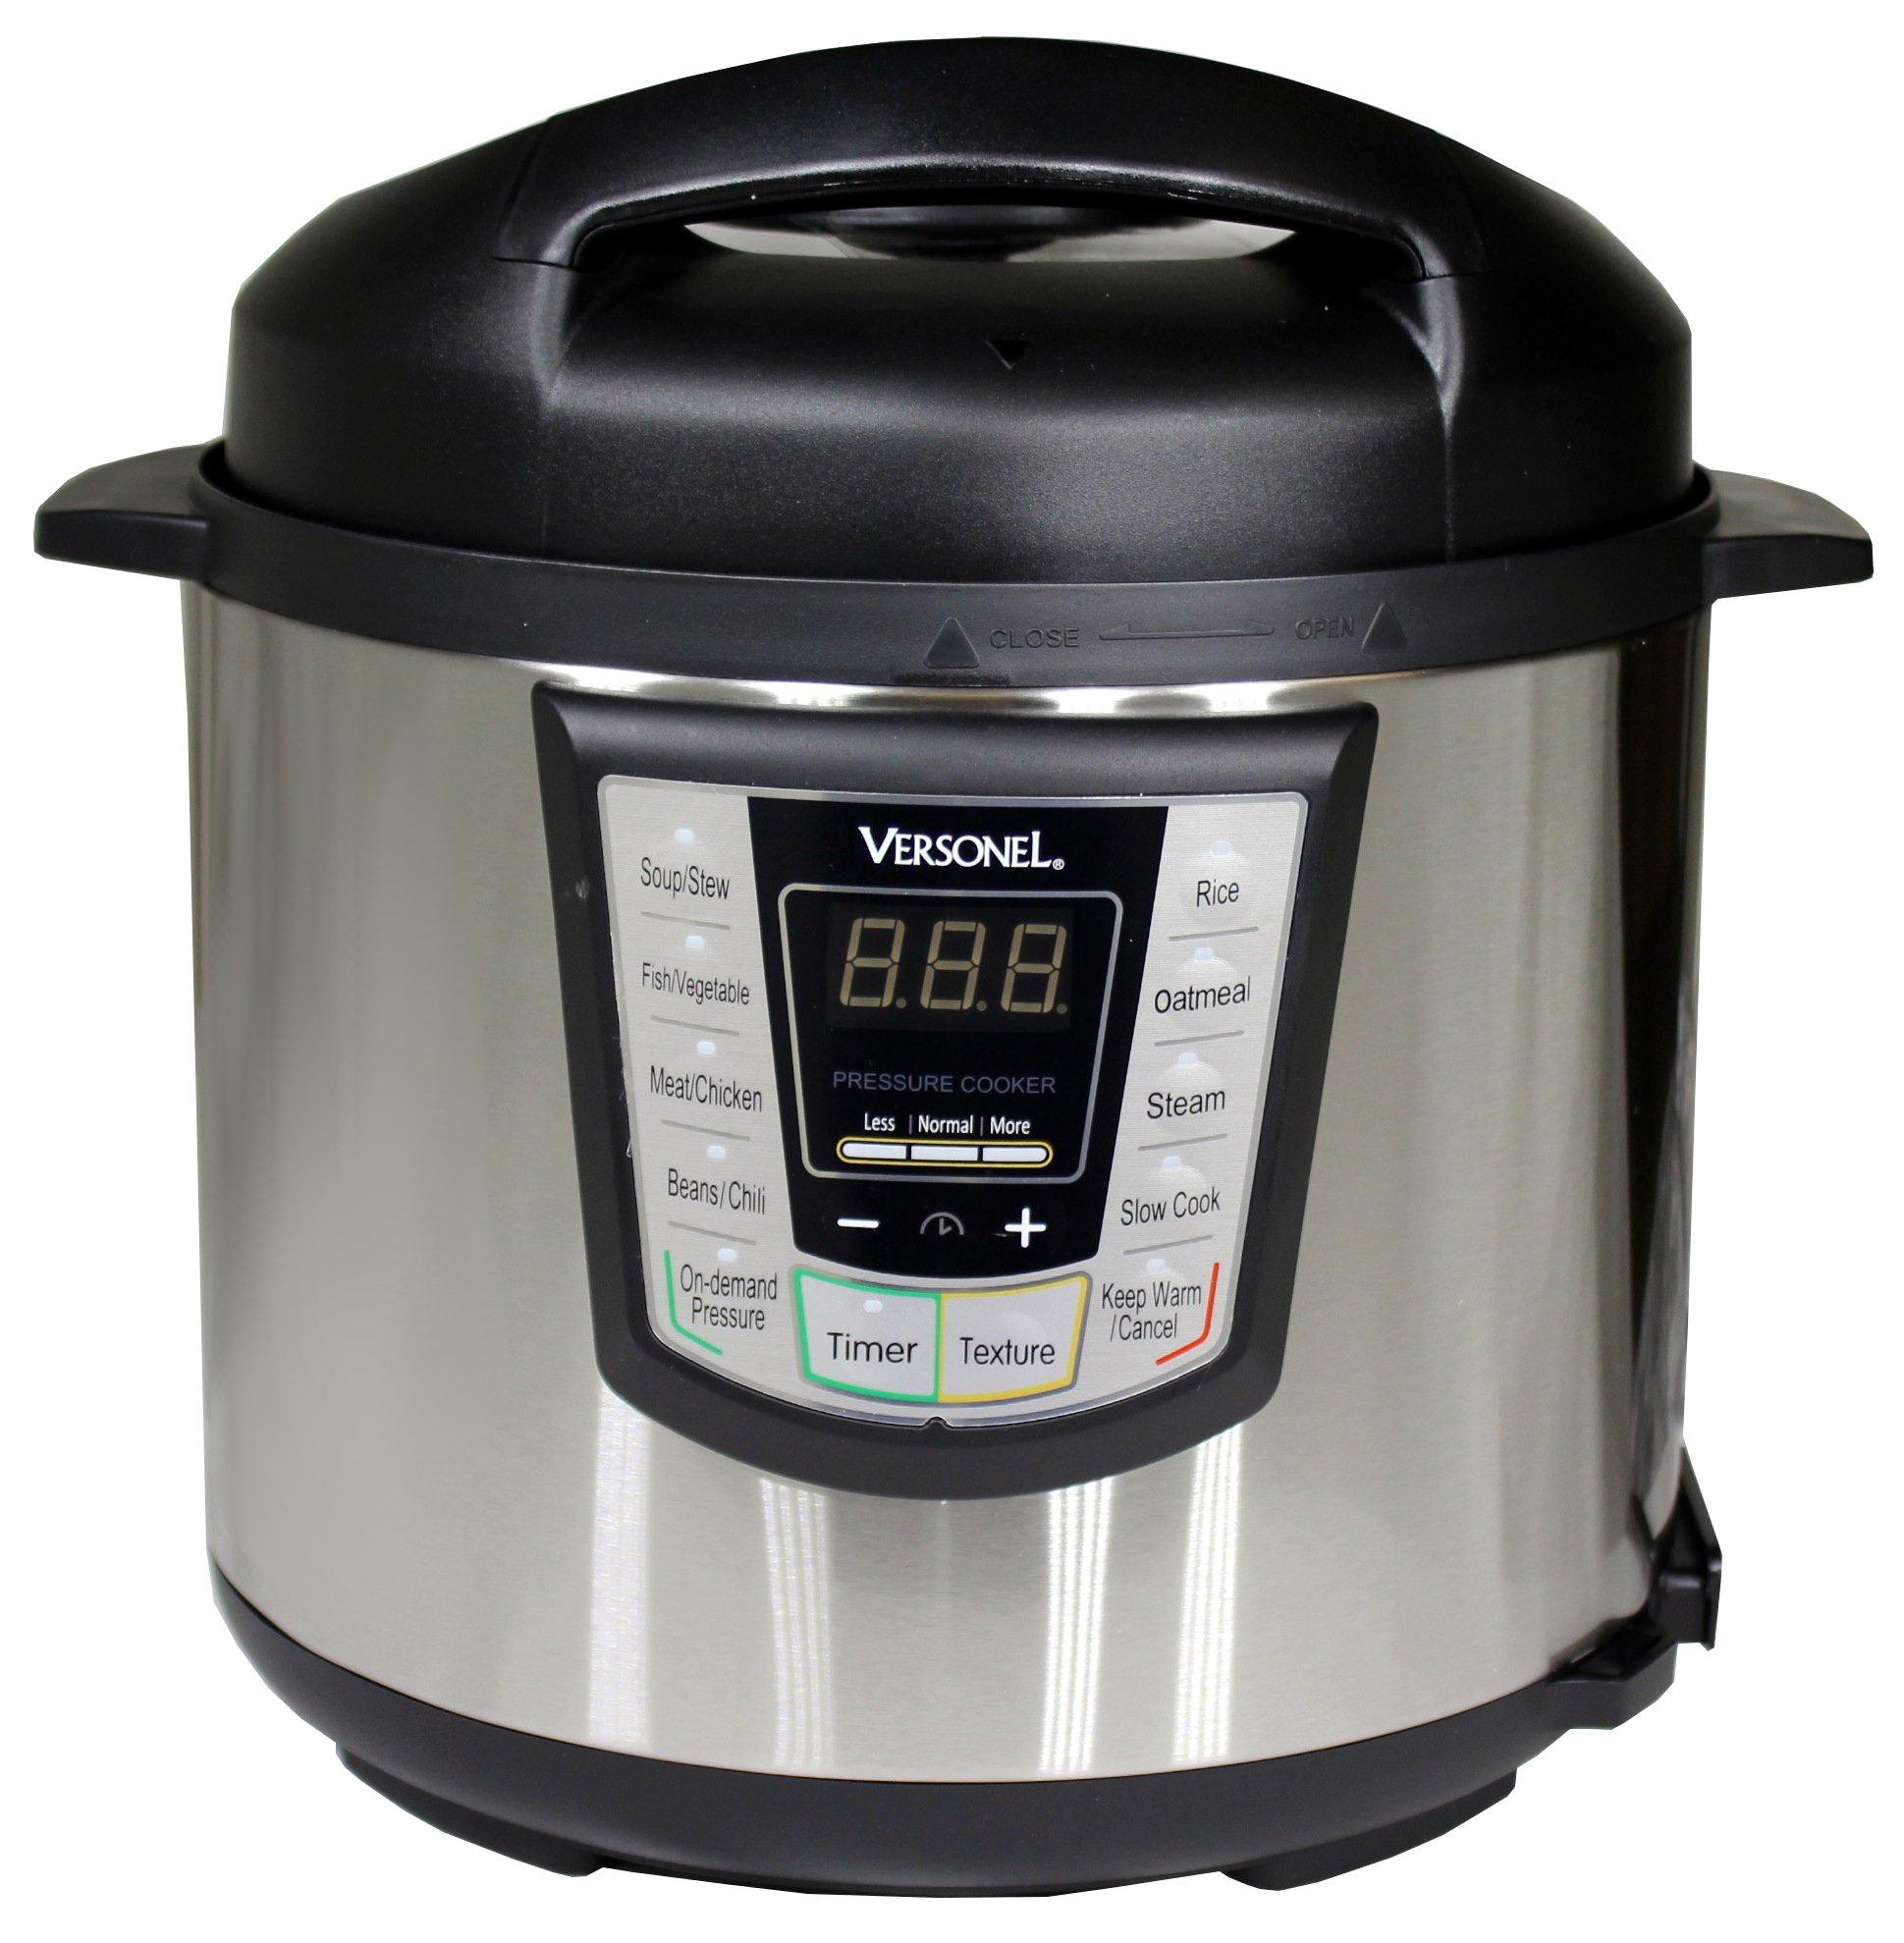 Versonel VSLPC60 Electric Pressure Cooker, Stainless Steel, 6 Quart